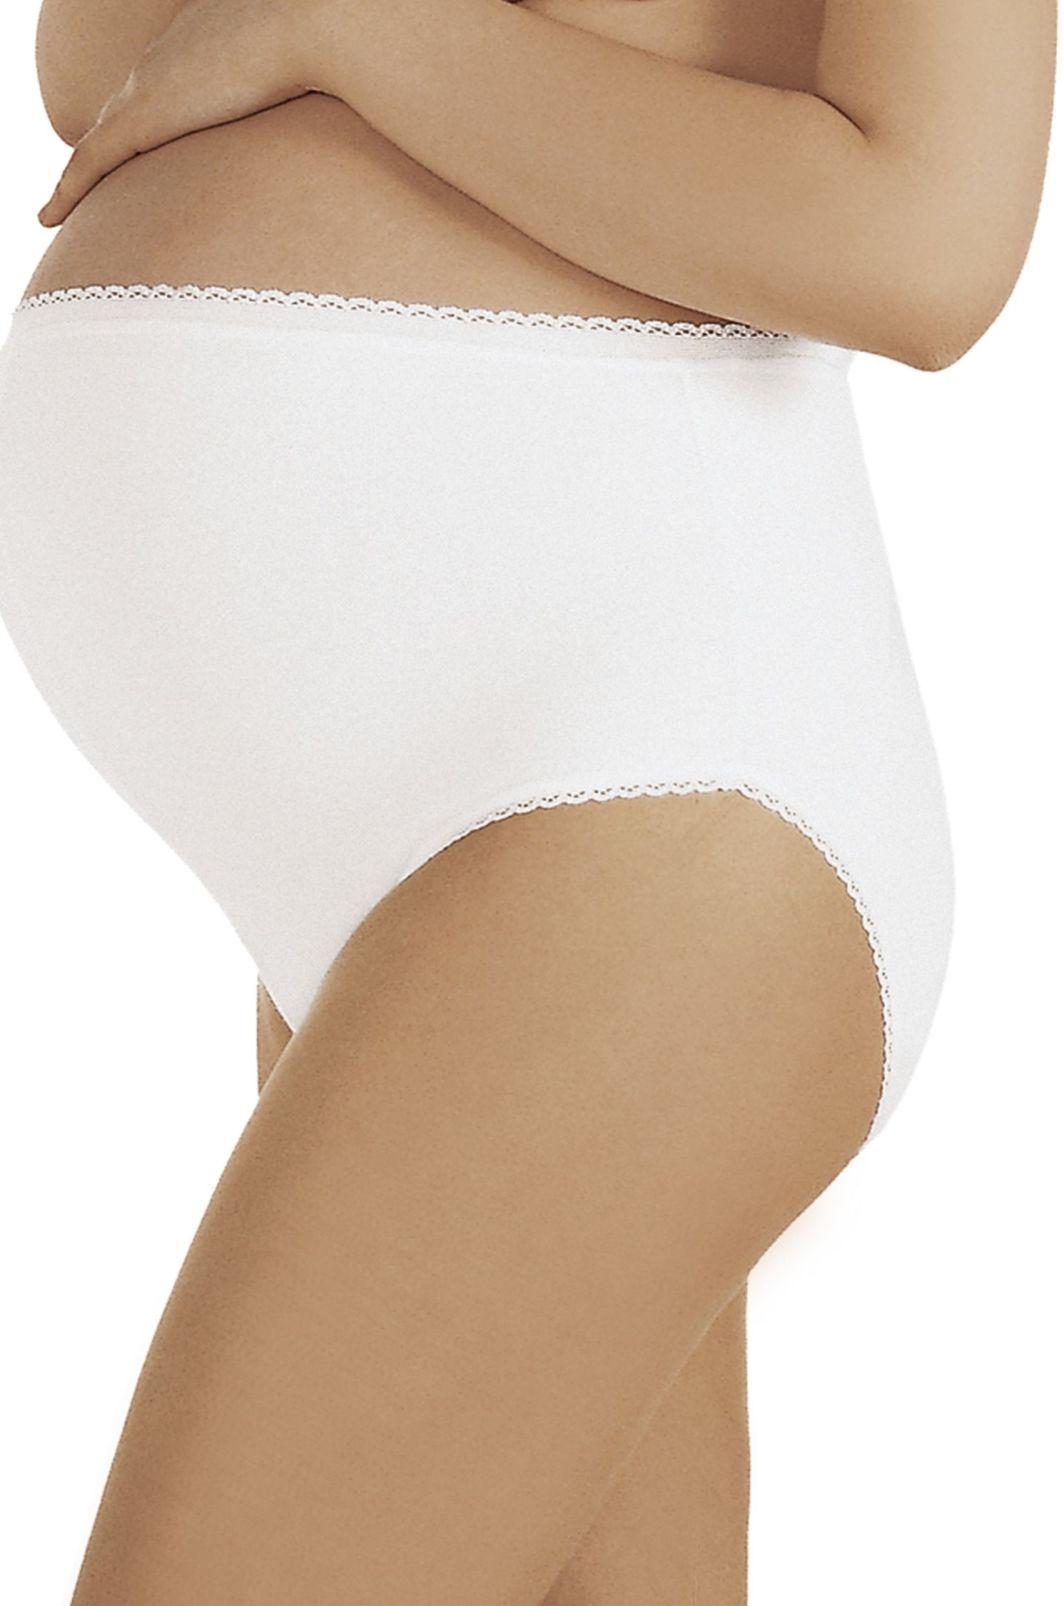 Italian fashion Majtki ciążowe Mama Maxi białe M 1